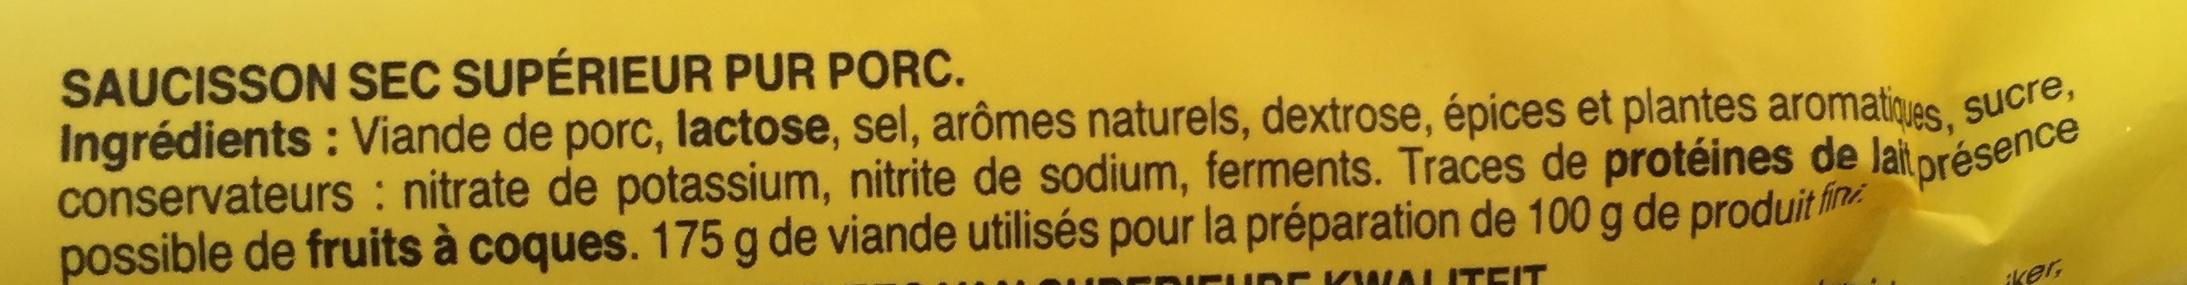 Le bâton de Berger (- 25 % de sel, - 30 % de MG) - Ingredientes